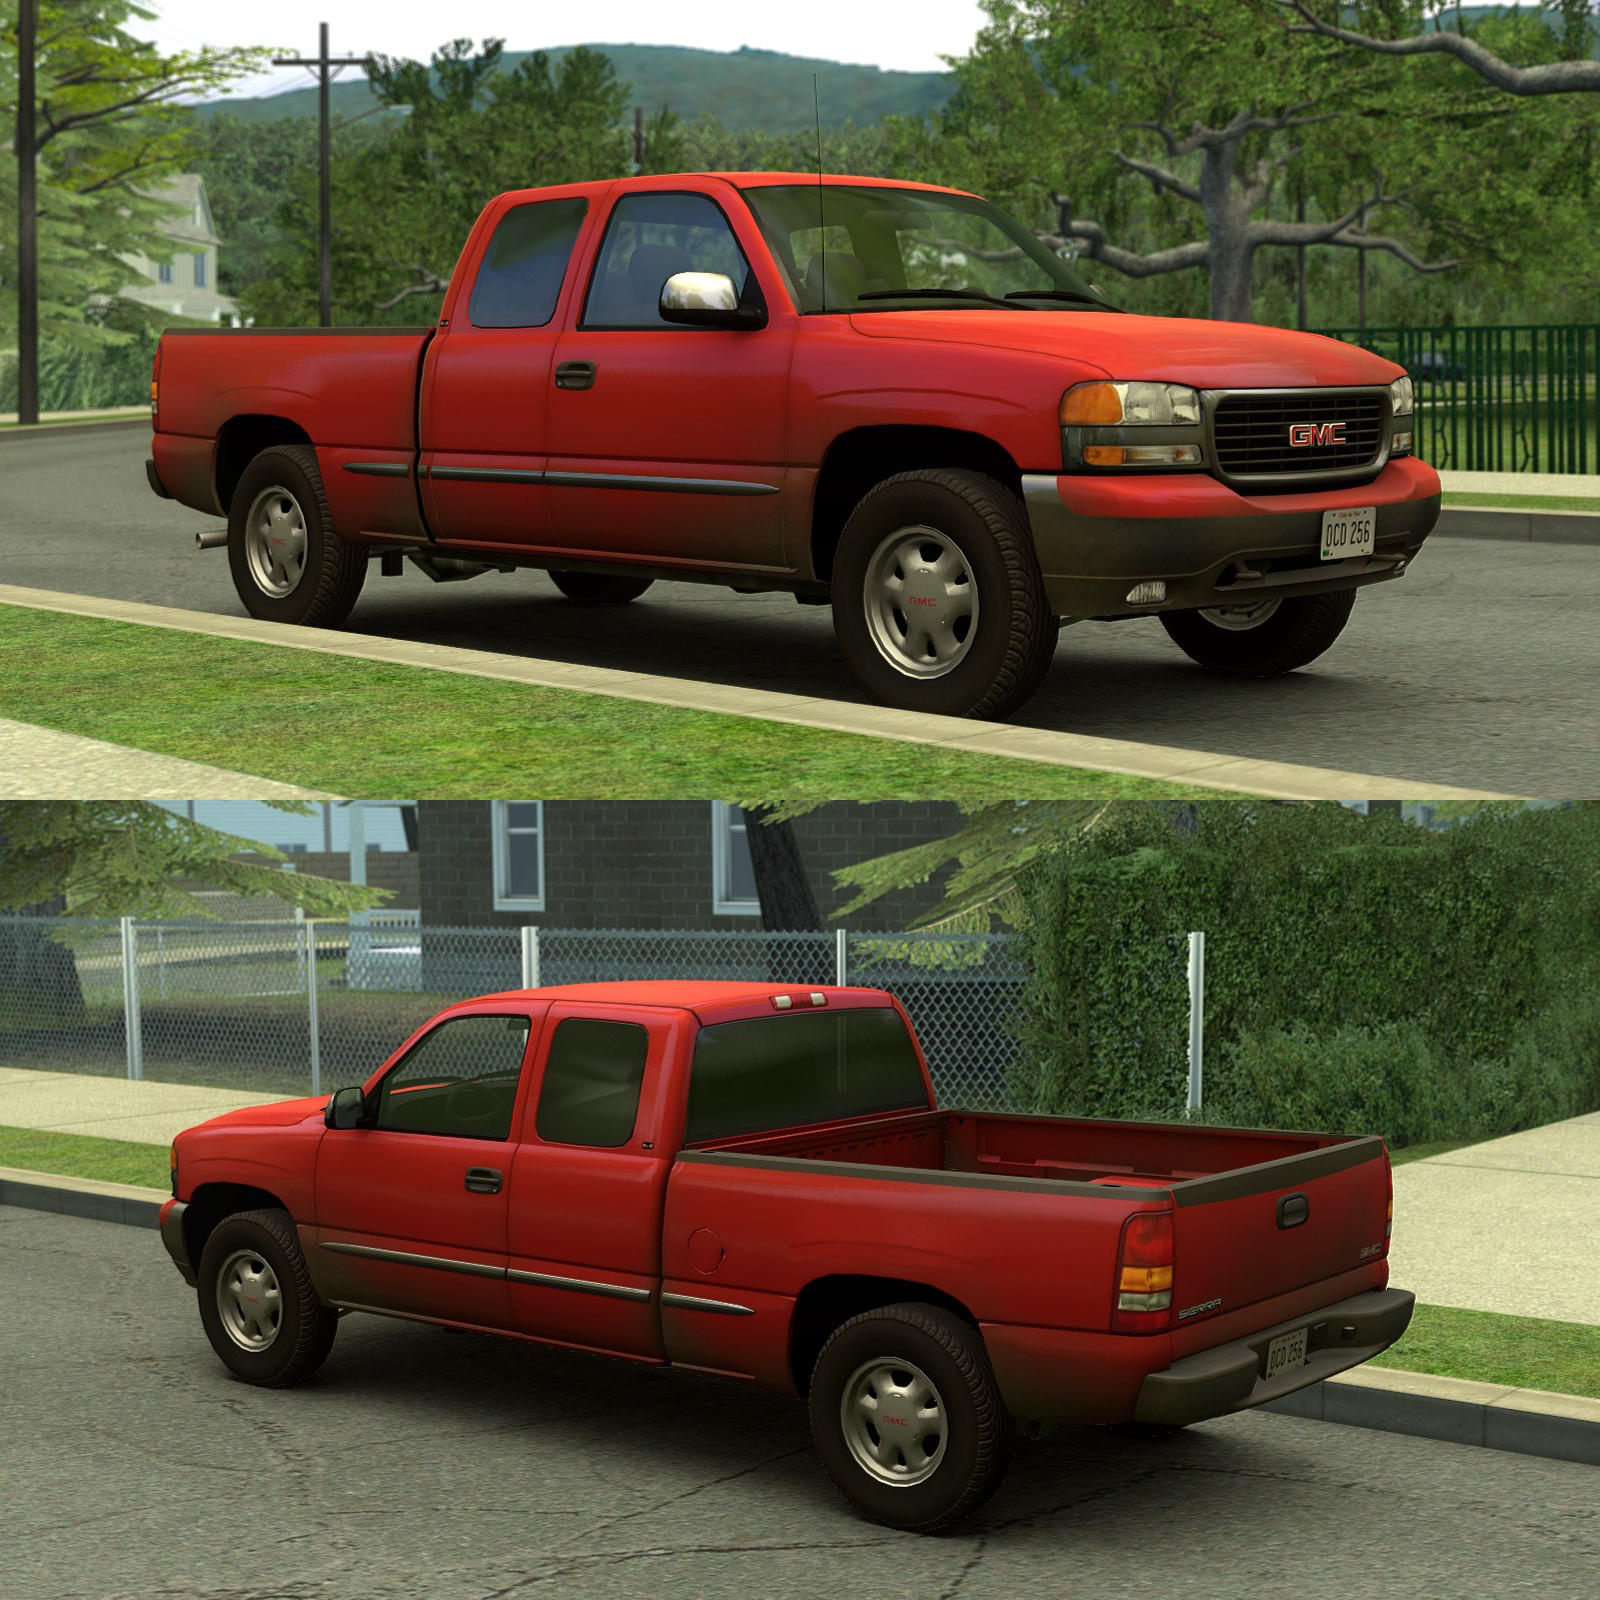 [Source] 1999 GMC Sierra 1500 Extended Cab by RushFreak2